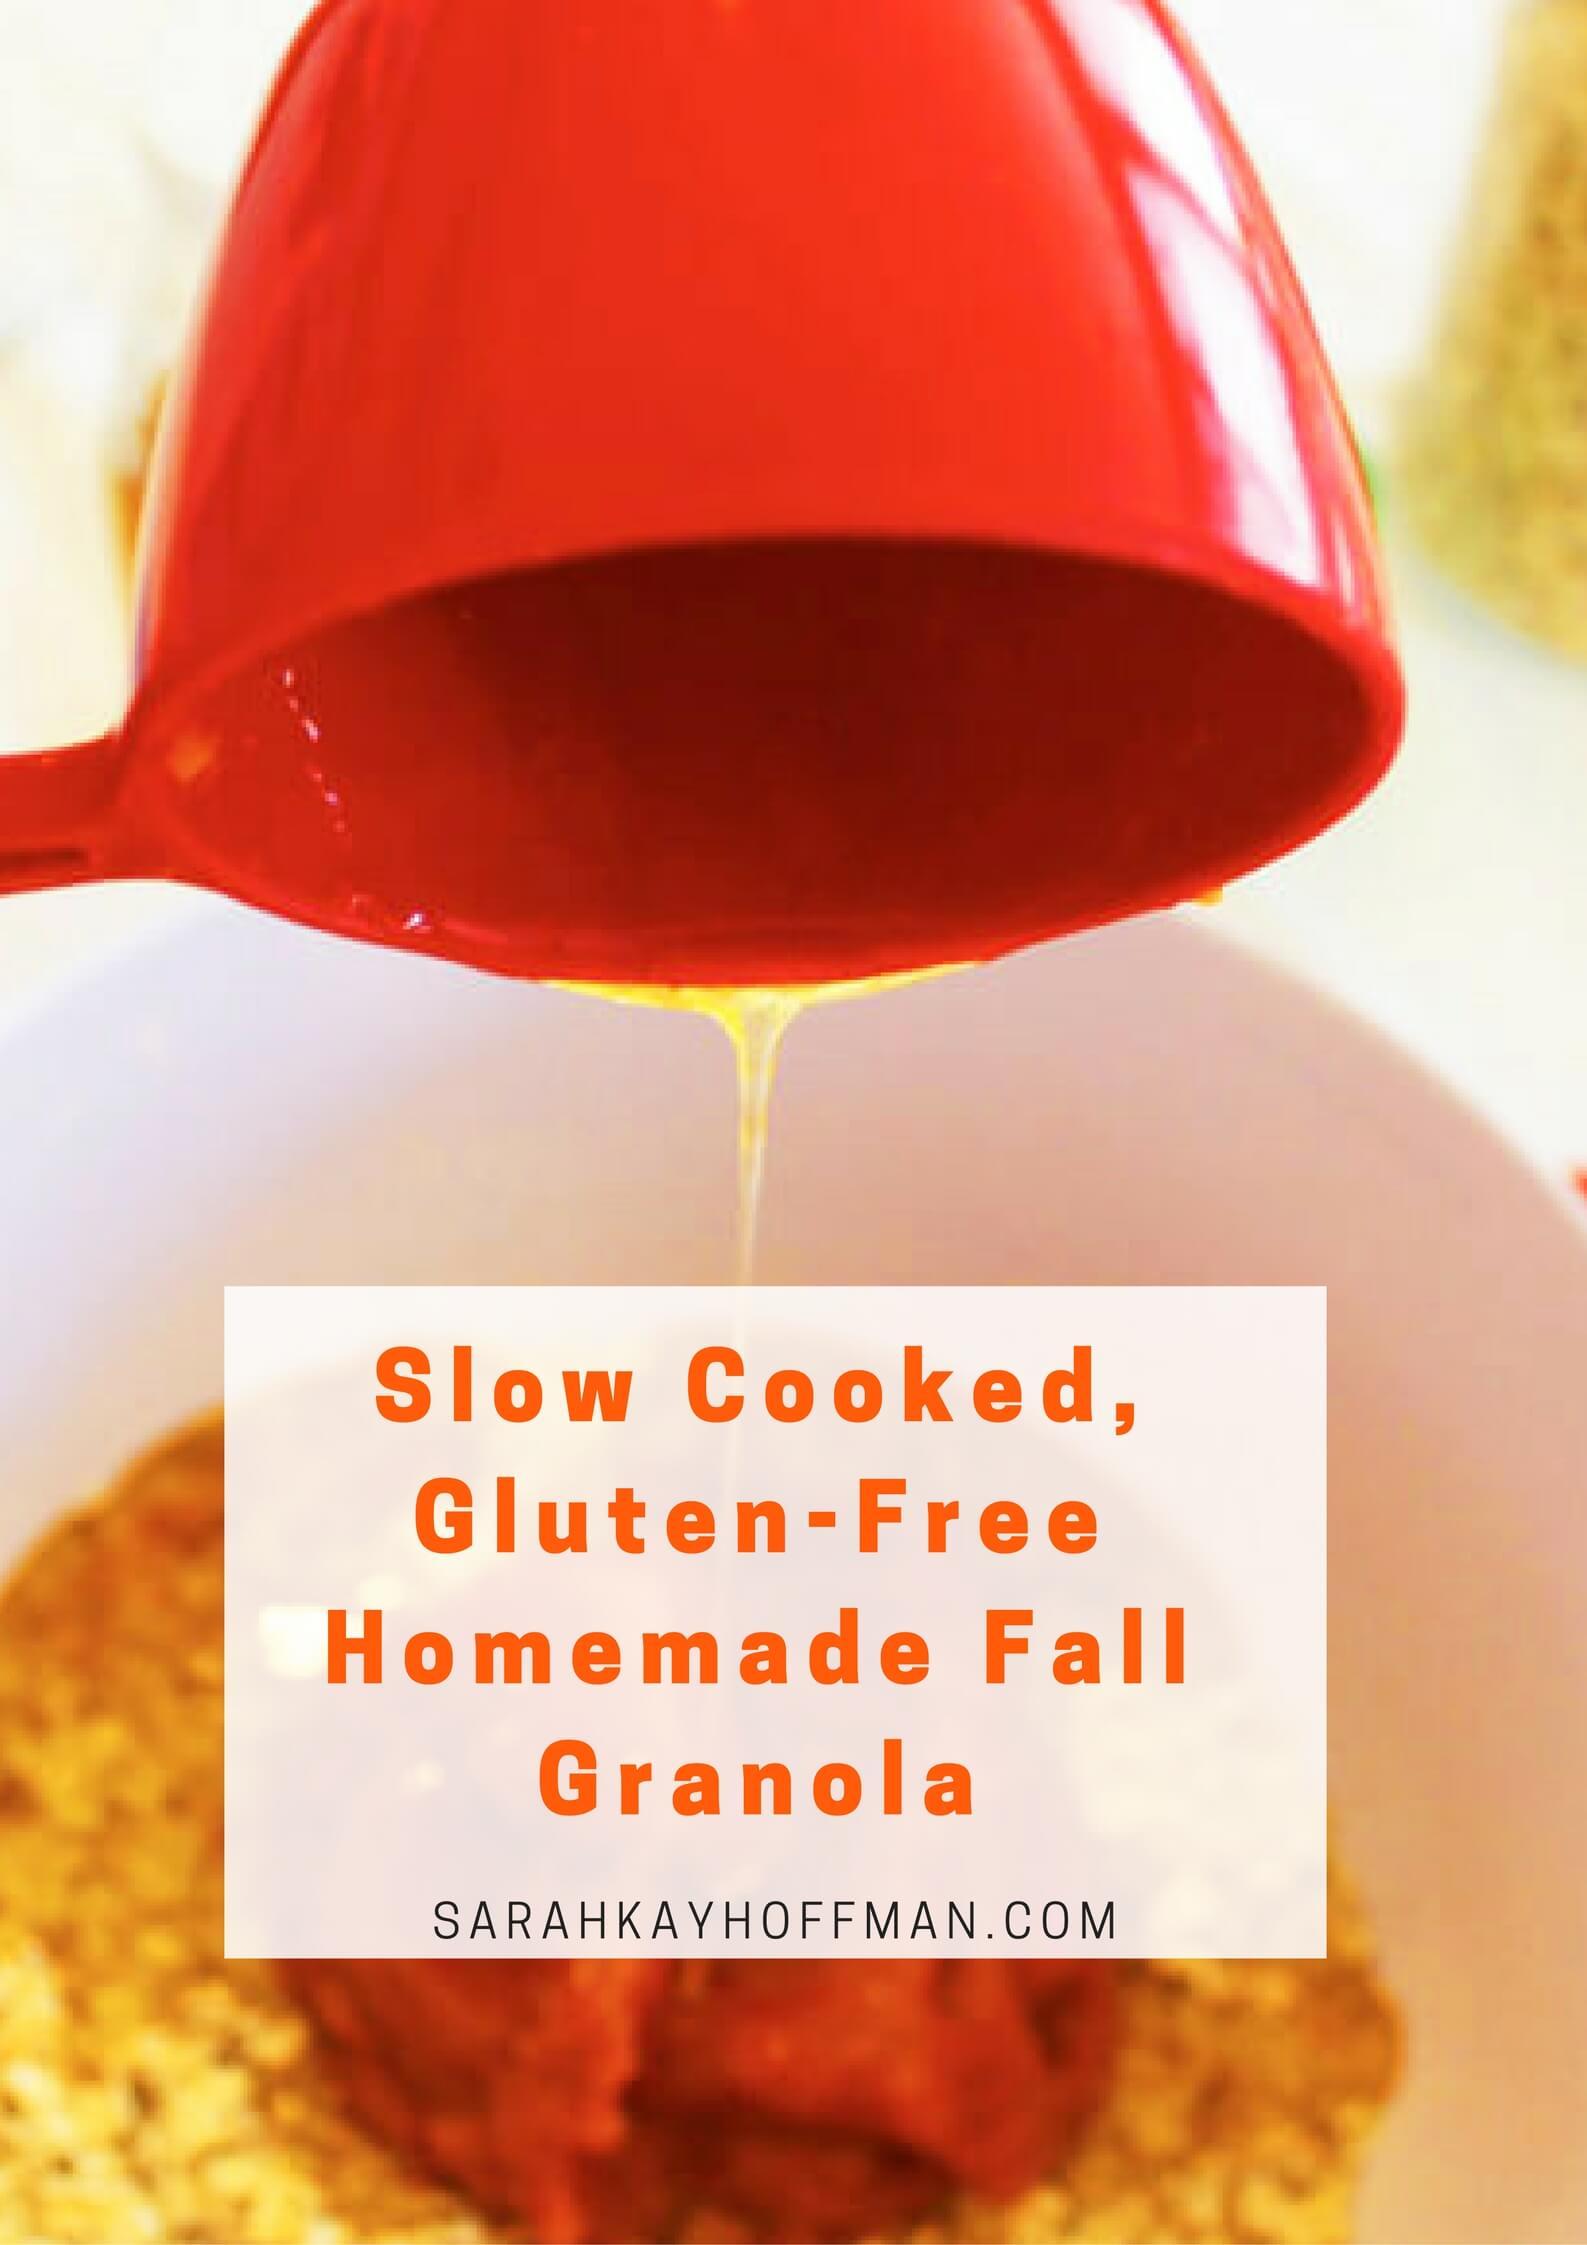 Slow Cooked, Gluten-Free Homemade Fall Granola via sarahkayhoffman.com #glutenfree #glutenfreerecipes #granola #fall